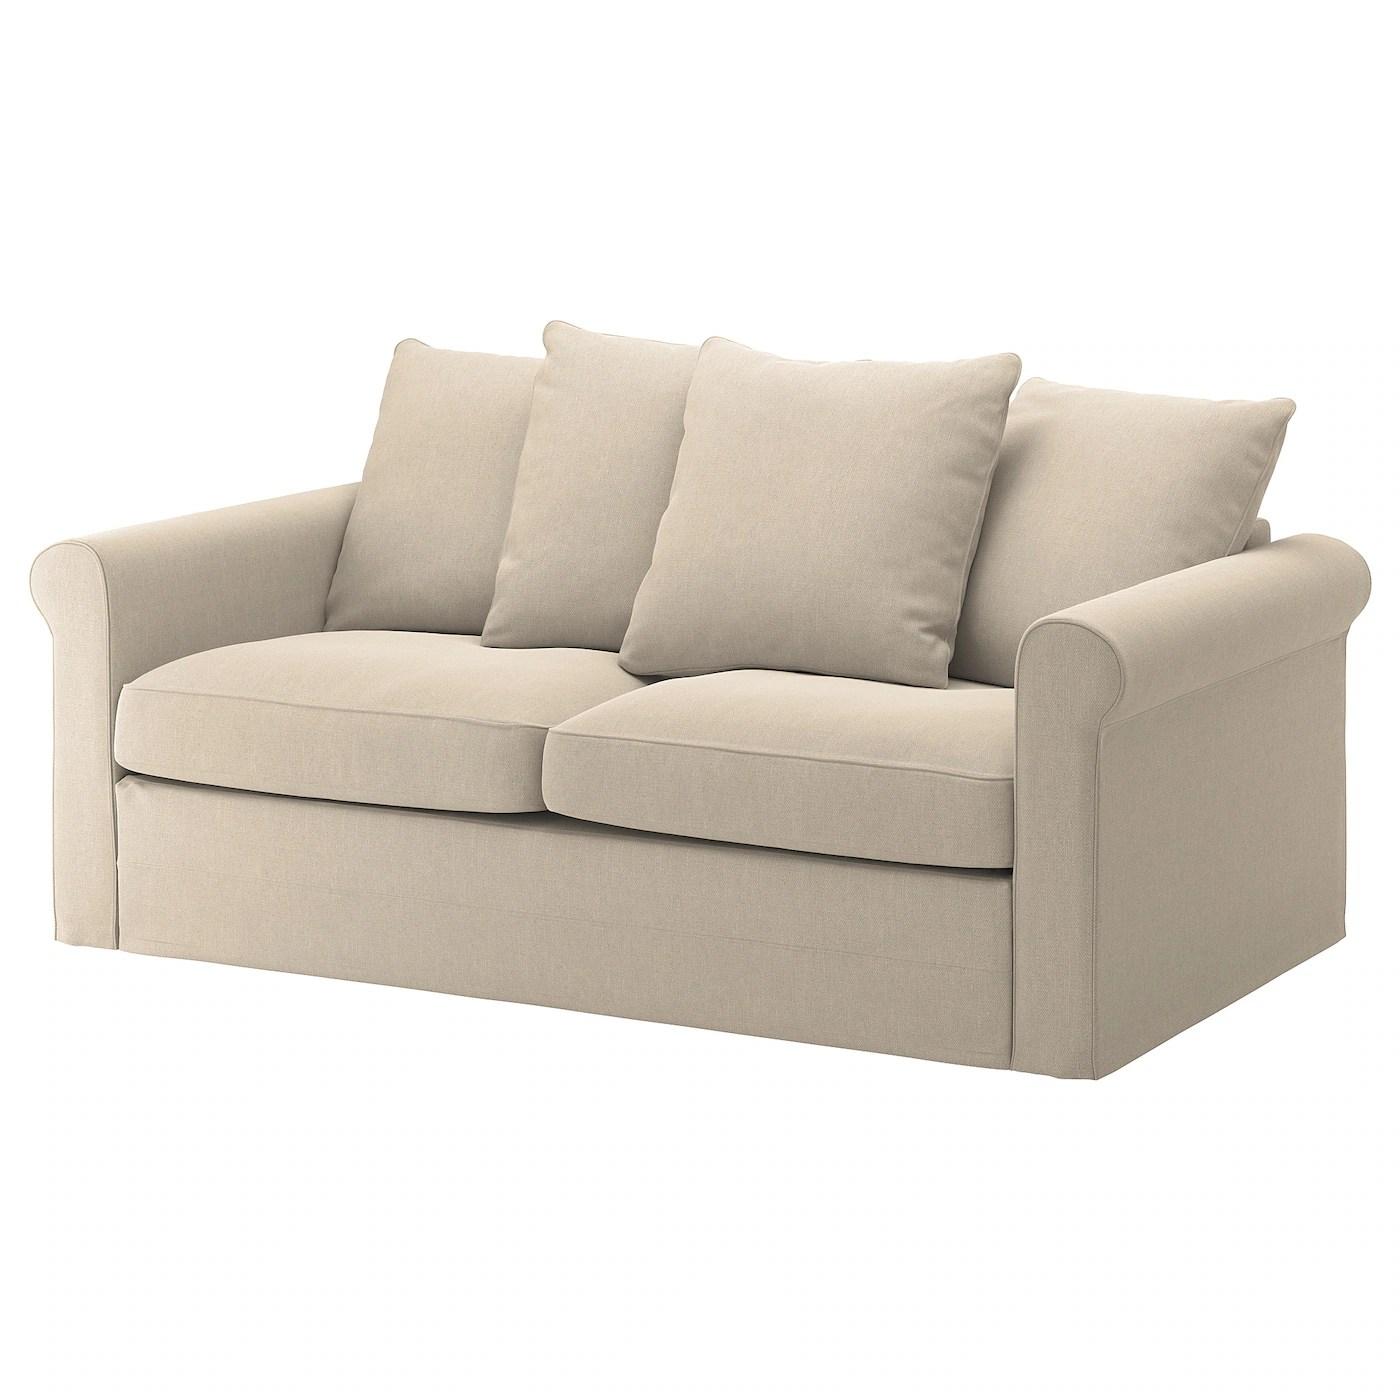 Gronlid 2 Seat Sofa Bed Sporda Natural Ikea